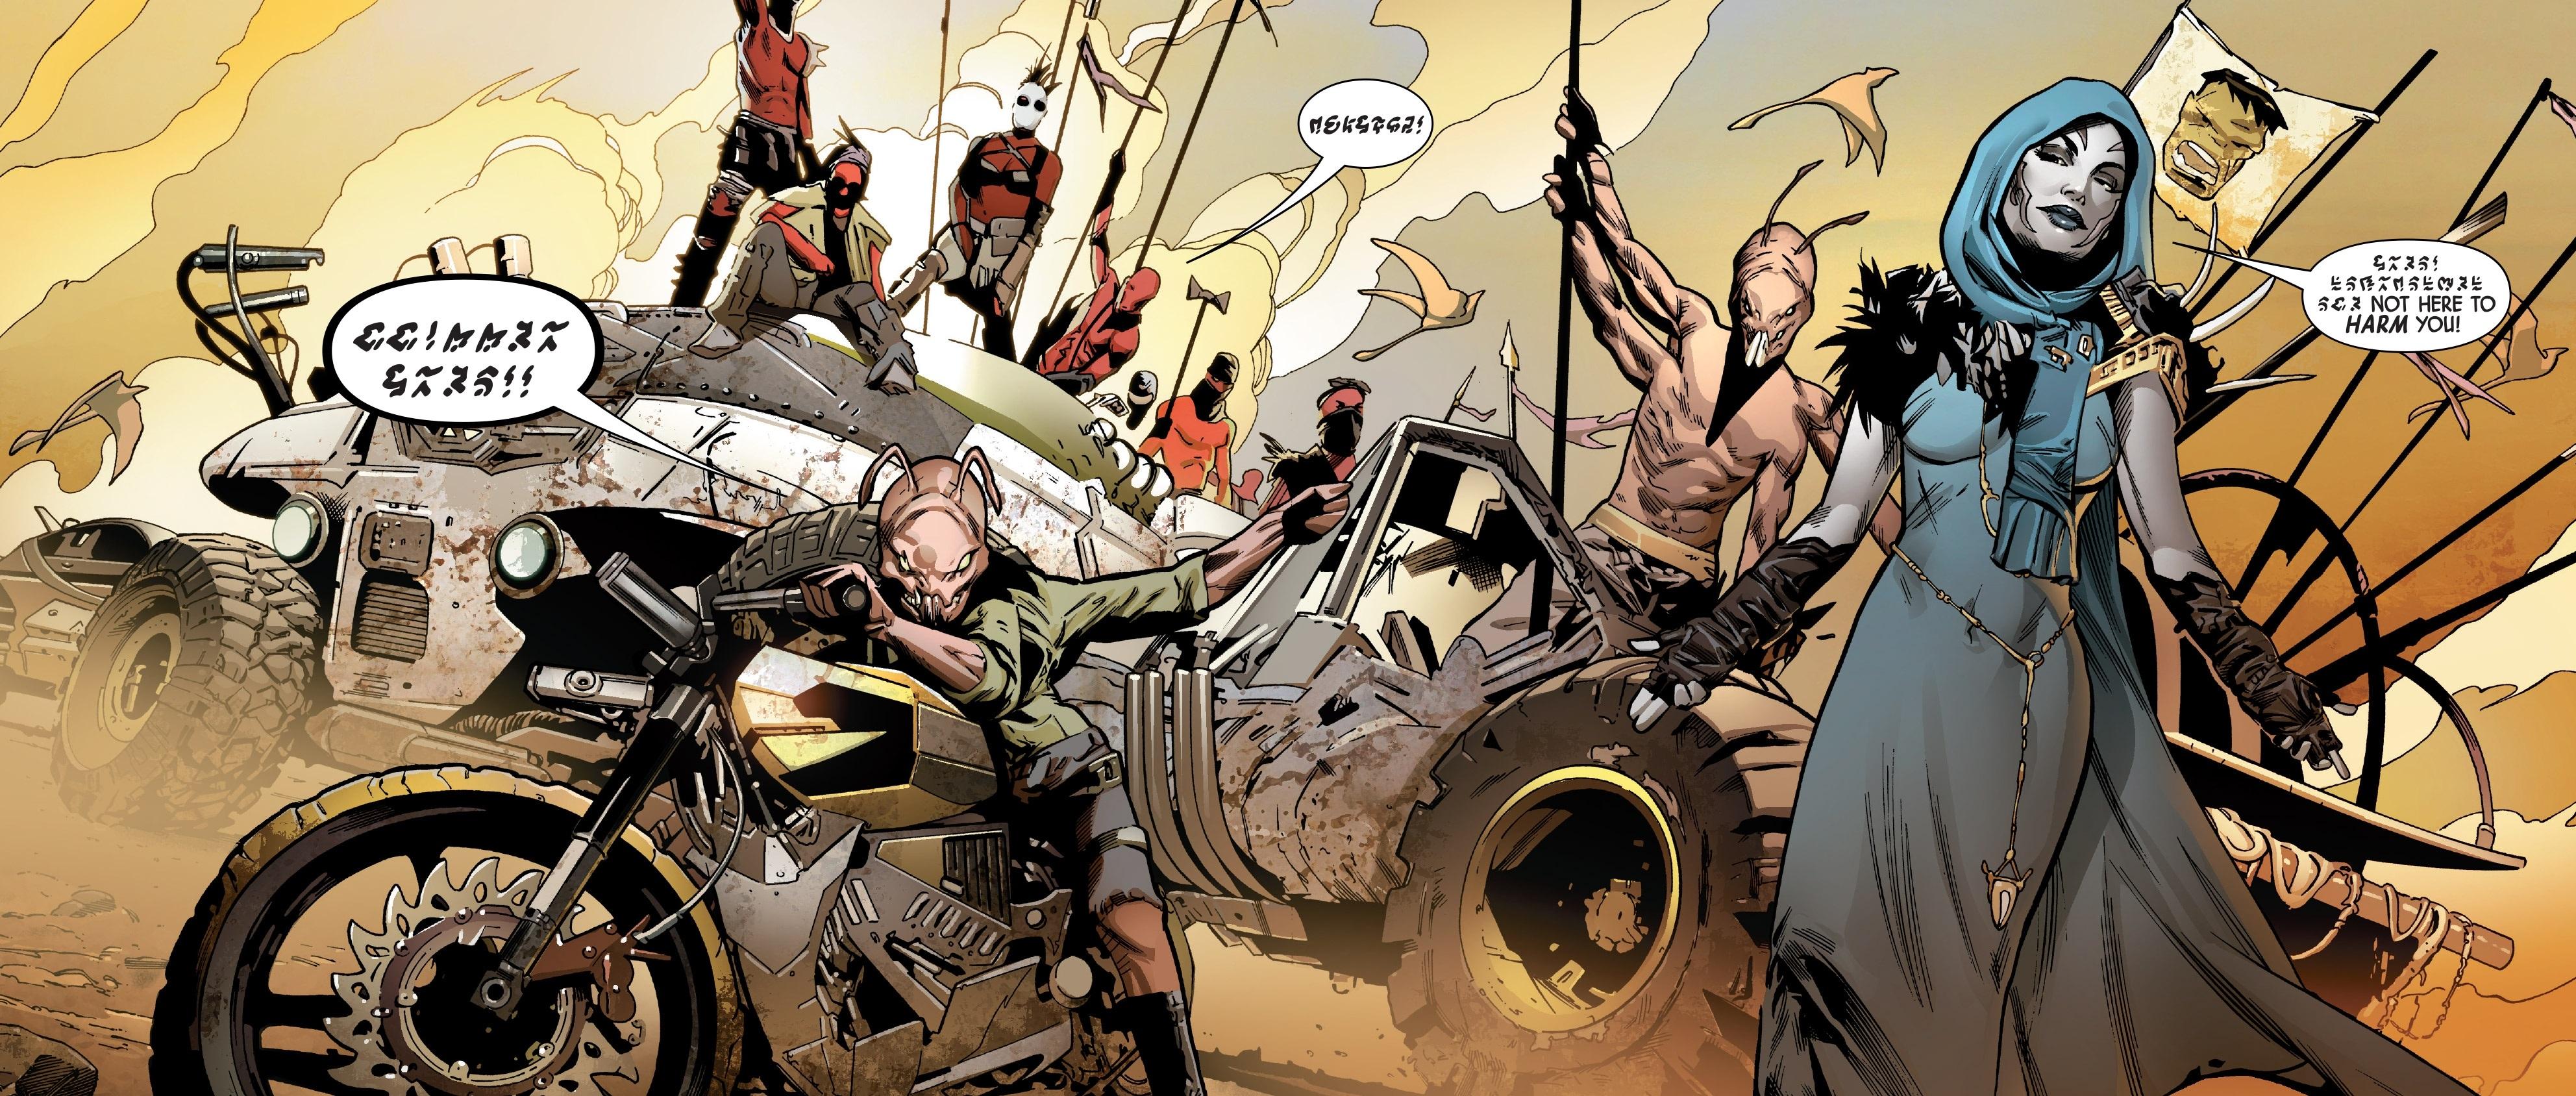 Doka'abi Clan (Earth-616) from Incredible Hulk Vol 1 709 001.jpg